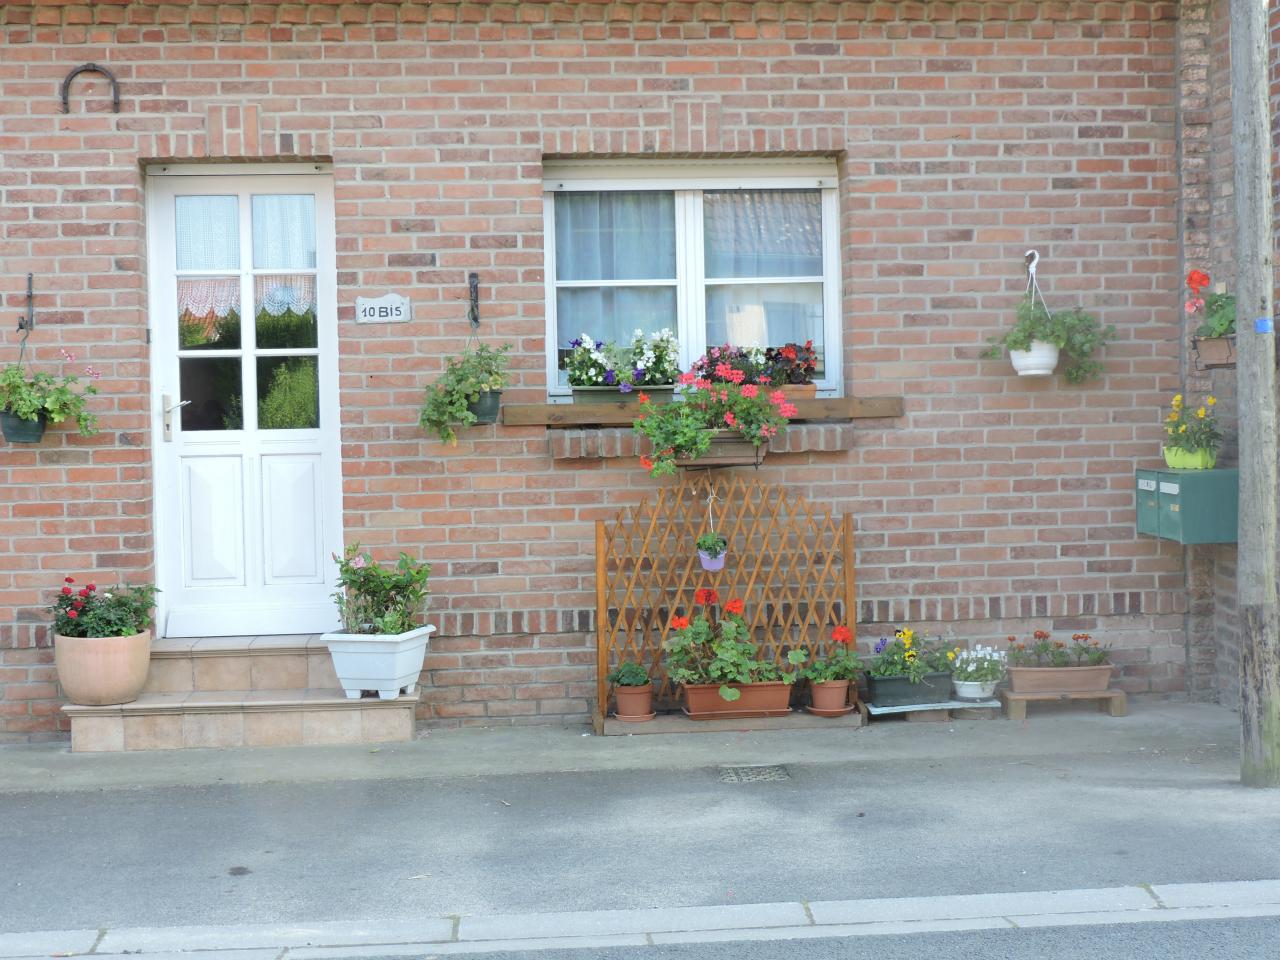 Maisons fleuries 2014 (3)